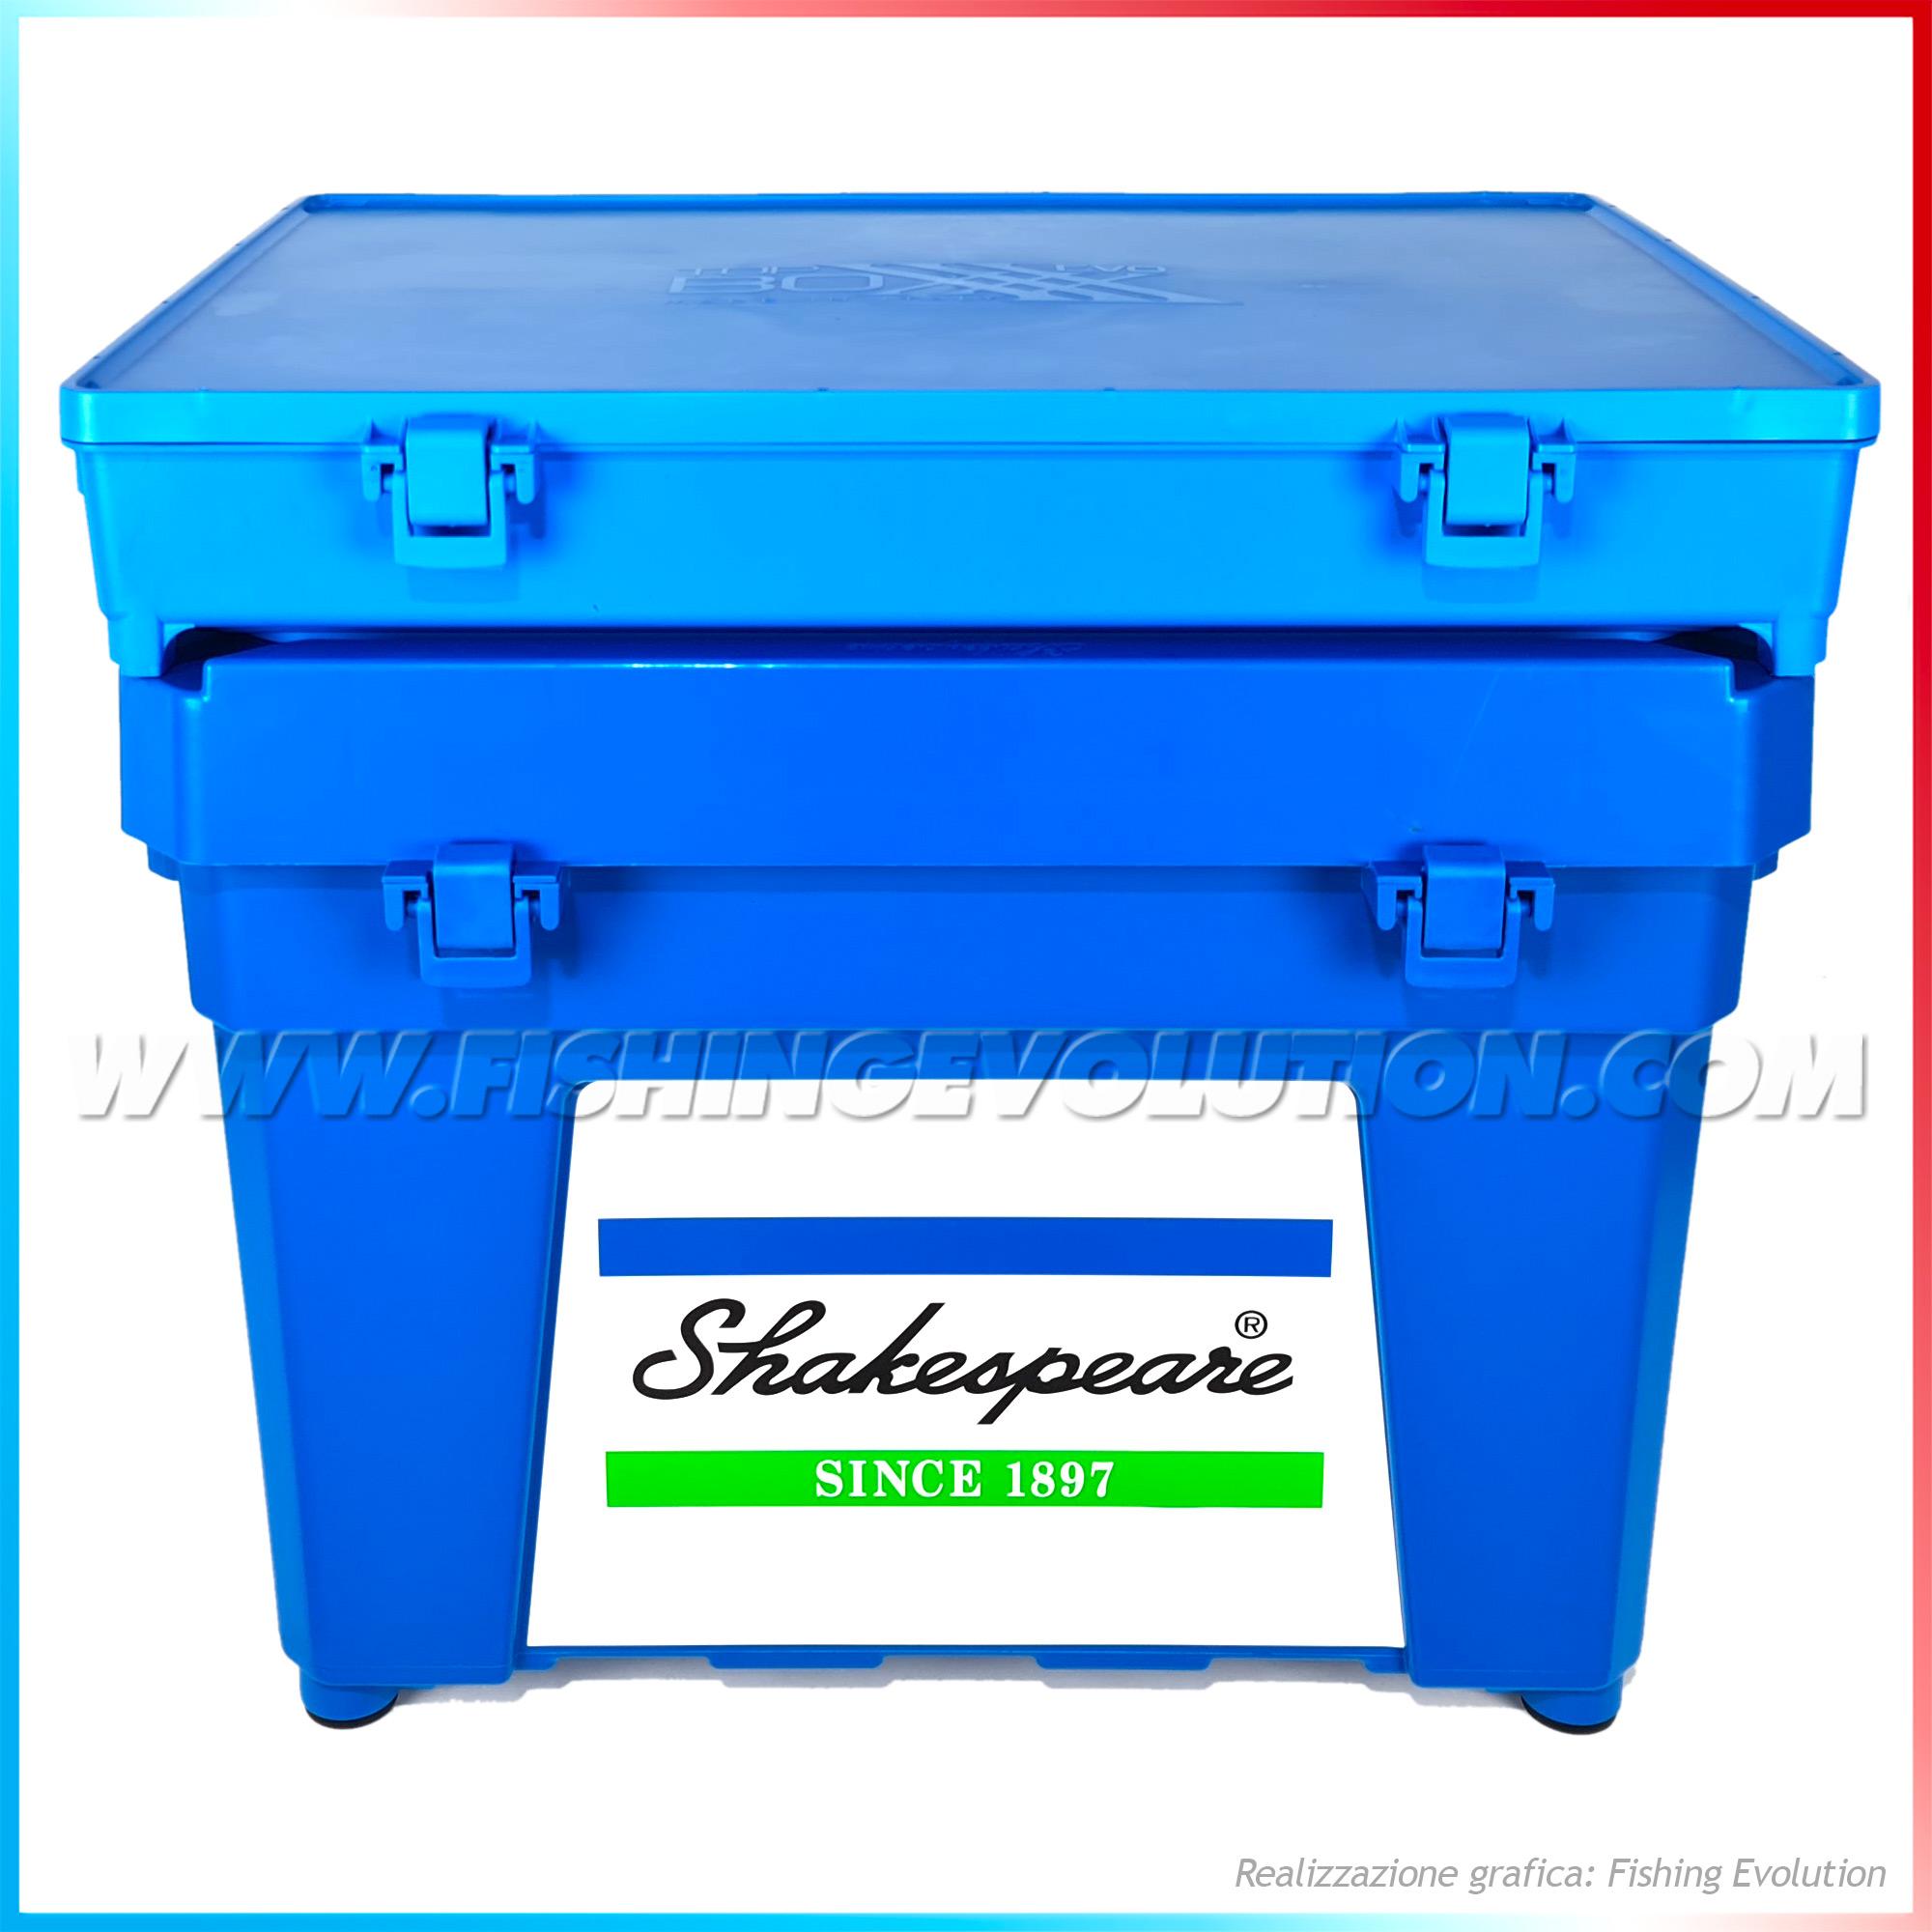 SkpBluTboxxx1.jpg